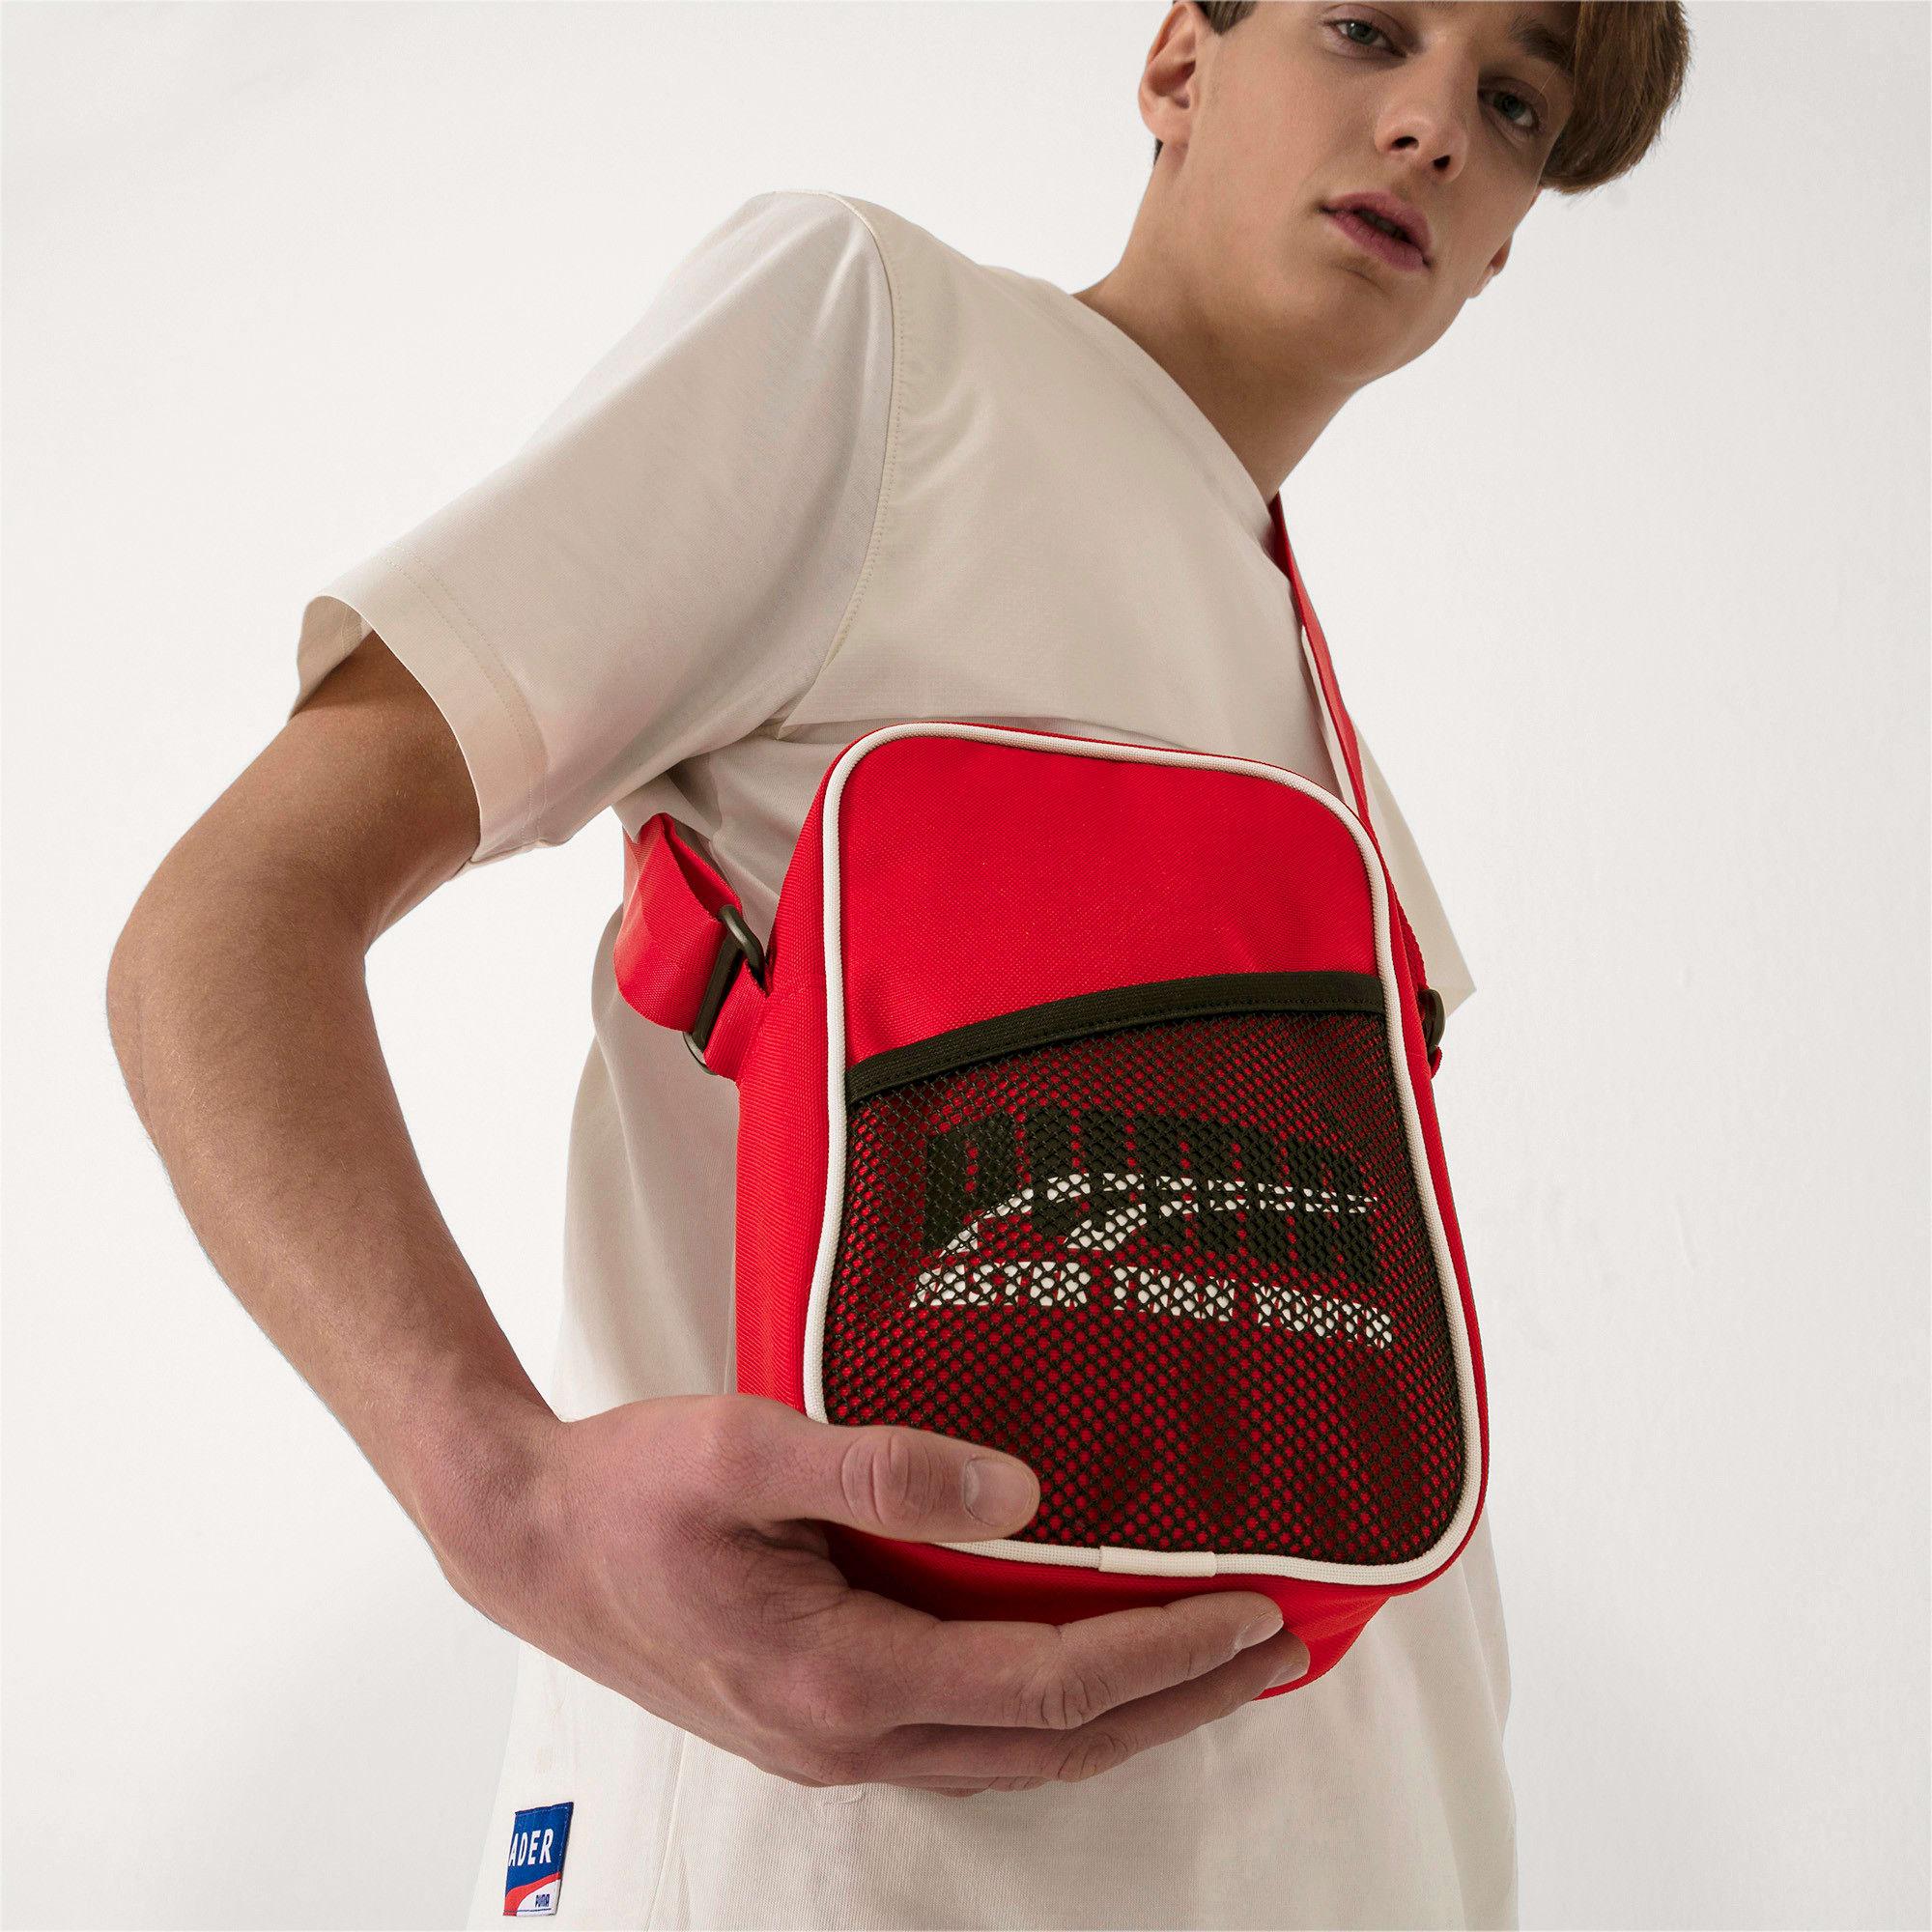 Thumbnail 3 of PUMA x ADER ERROR Portable Bag, Puma Red, medium